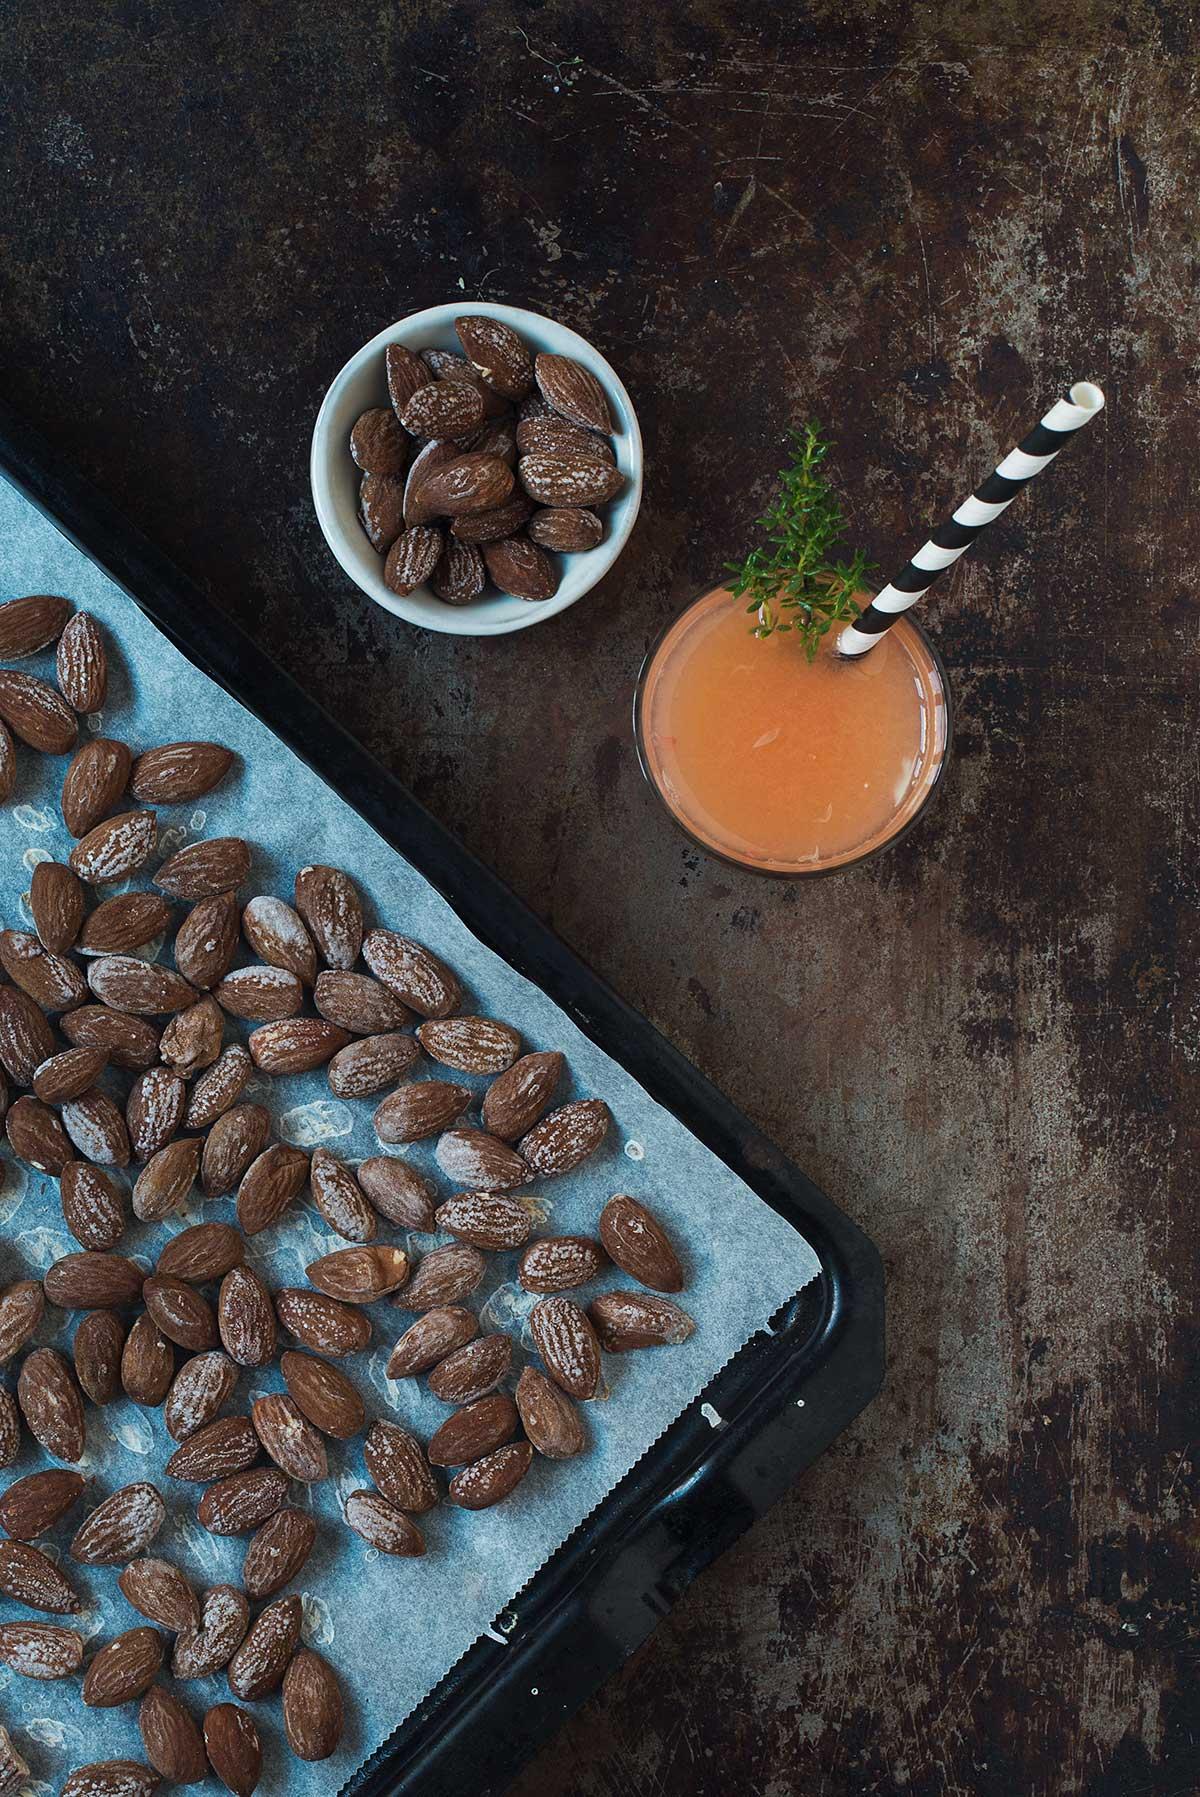 Recept: Salta mandlar | Frk. Kräsen